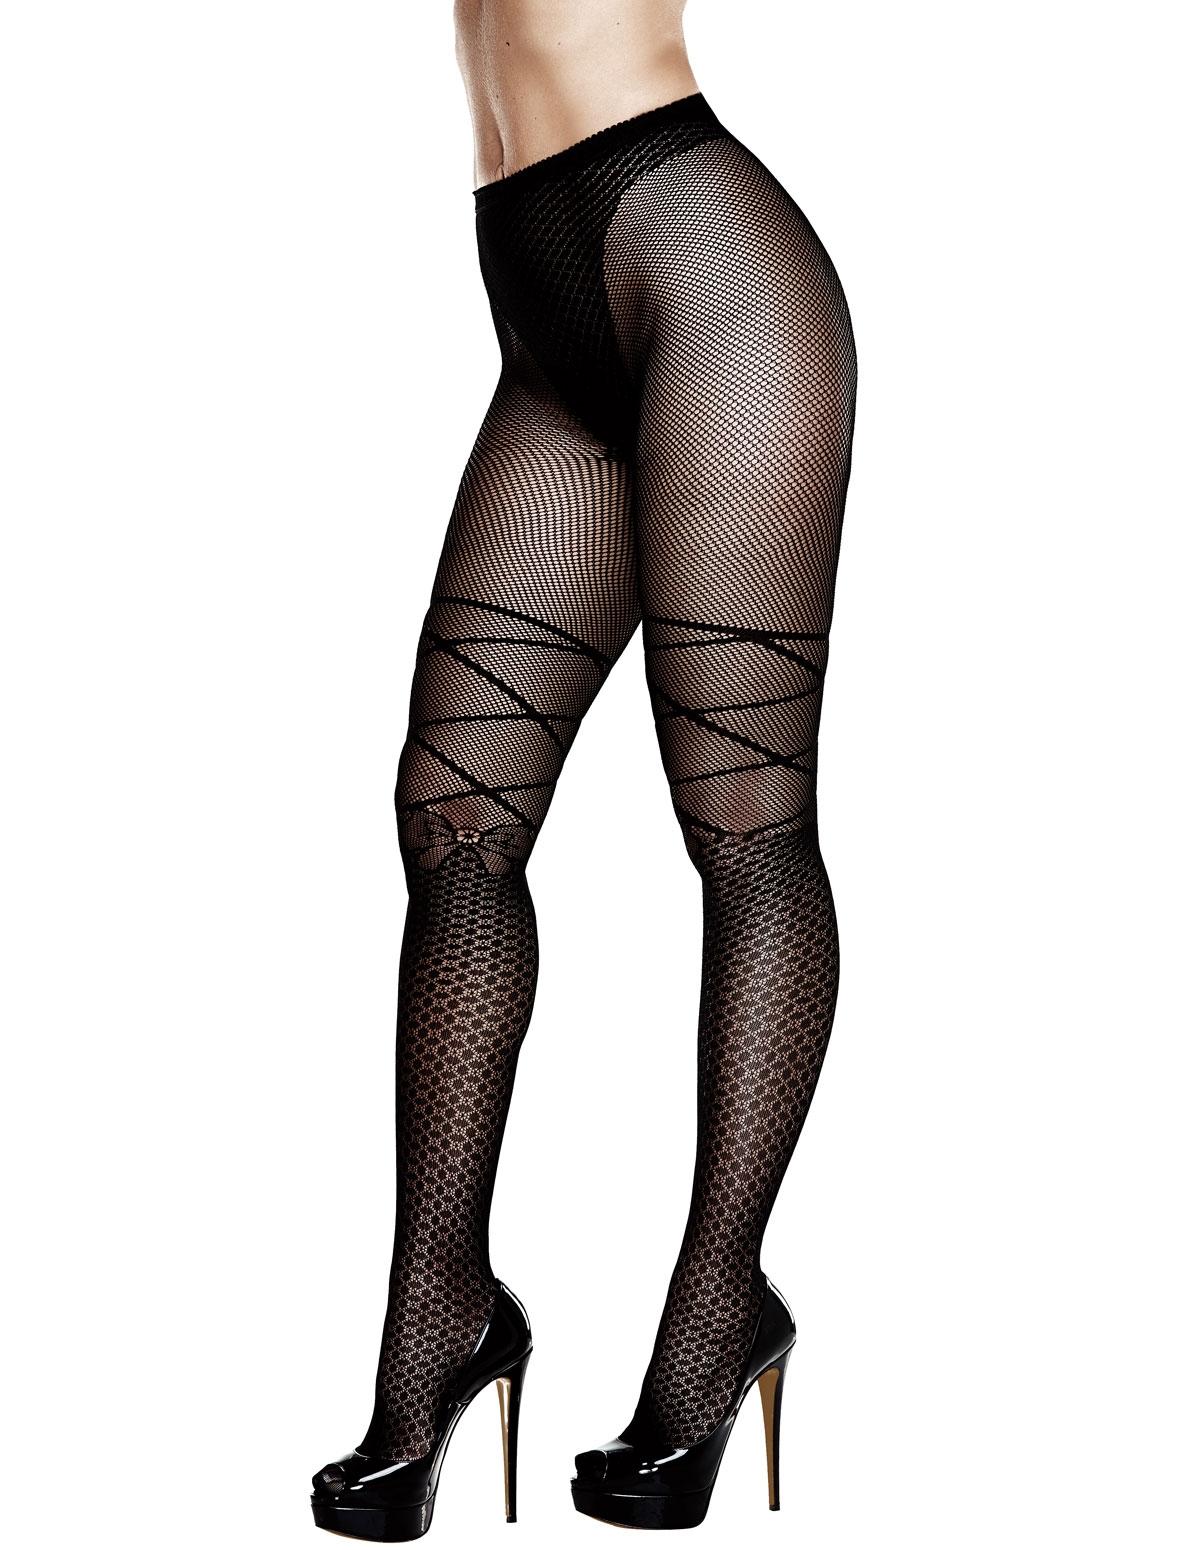 Jacquard Plus Size Pantyhose With Bow